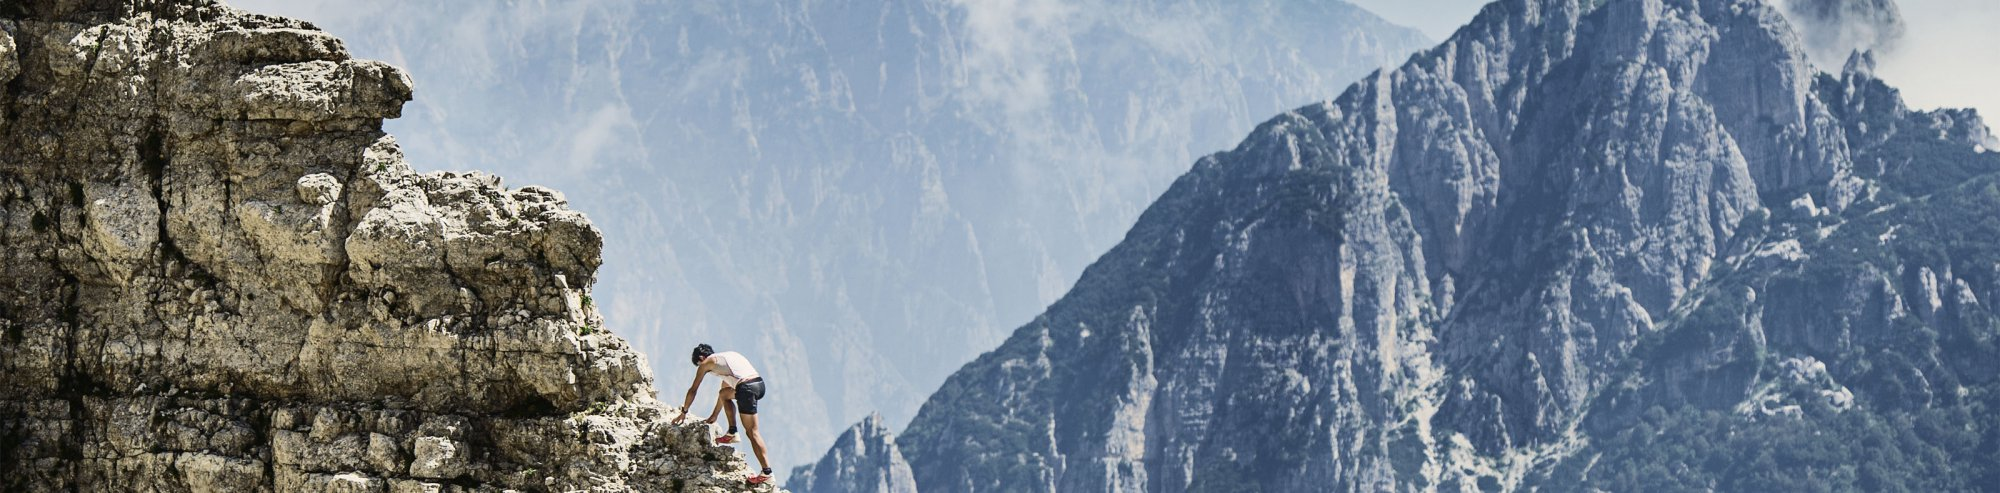 Killian Jornet scaling a mountain